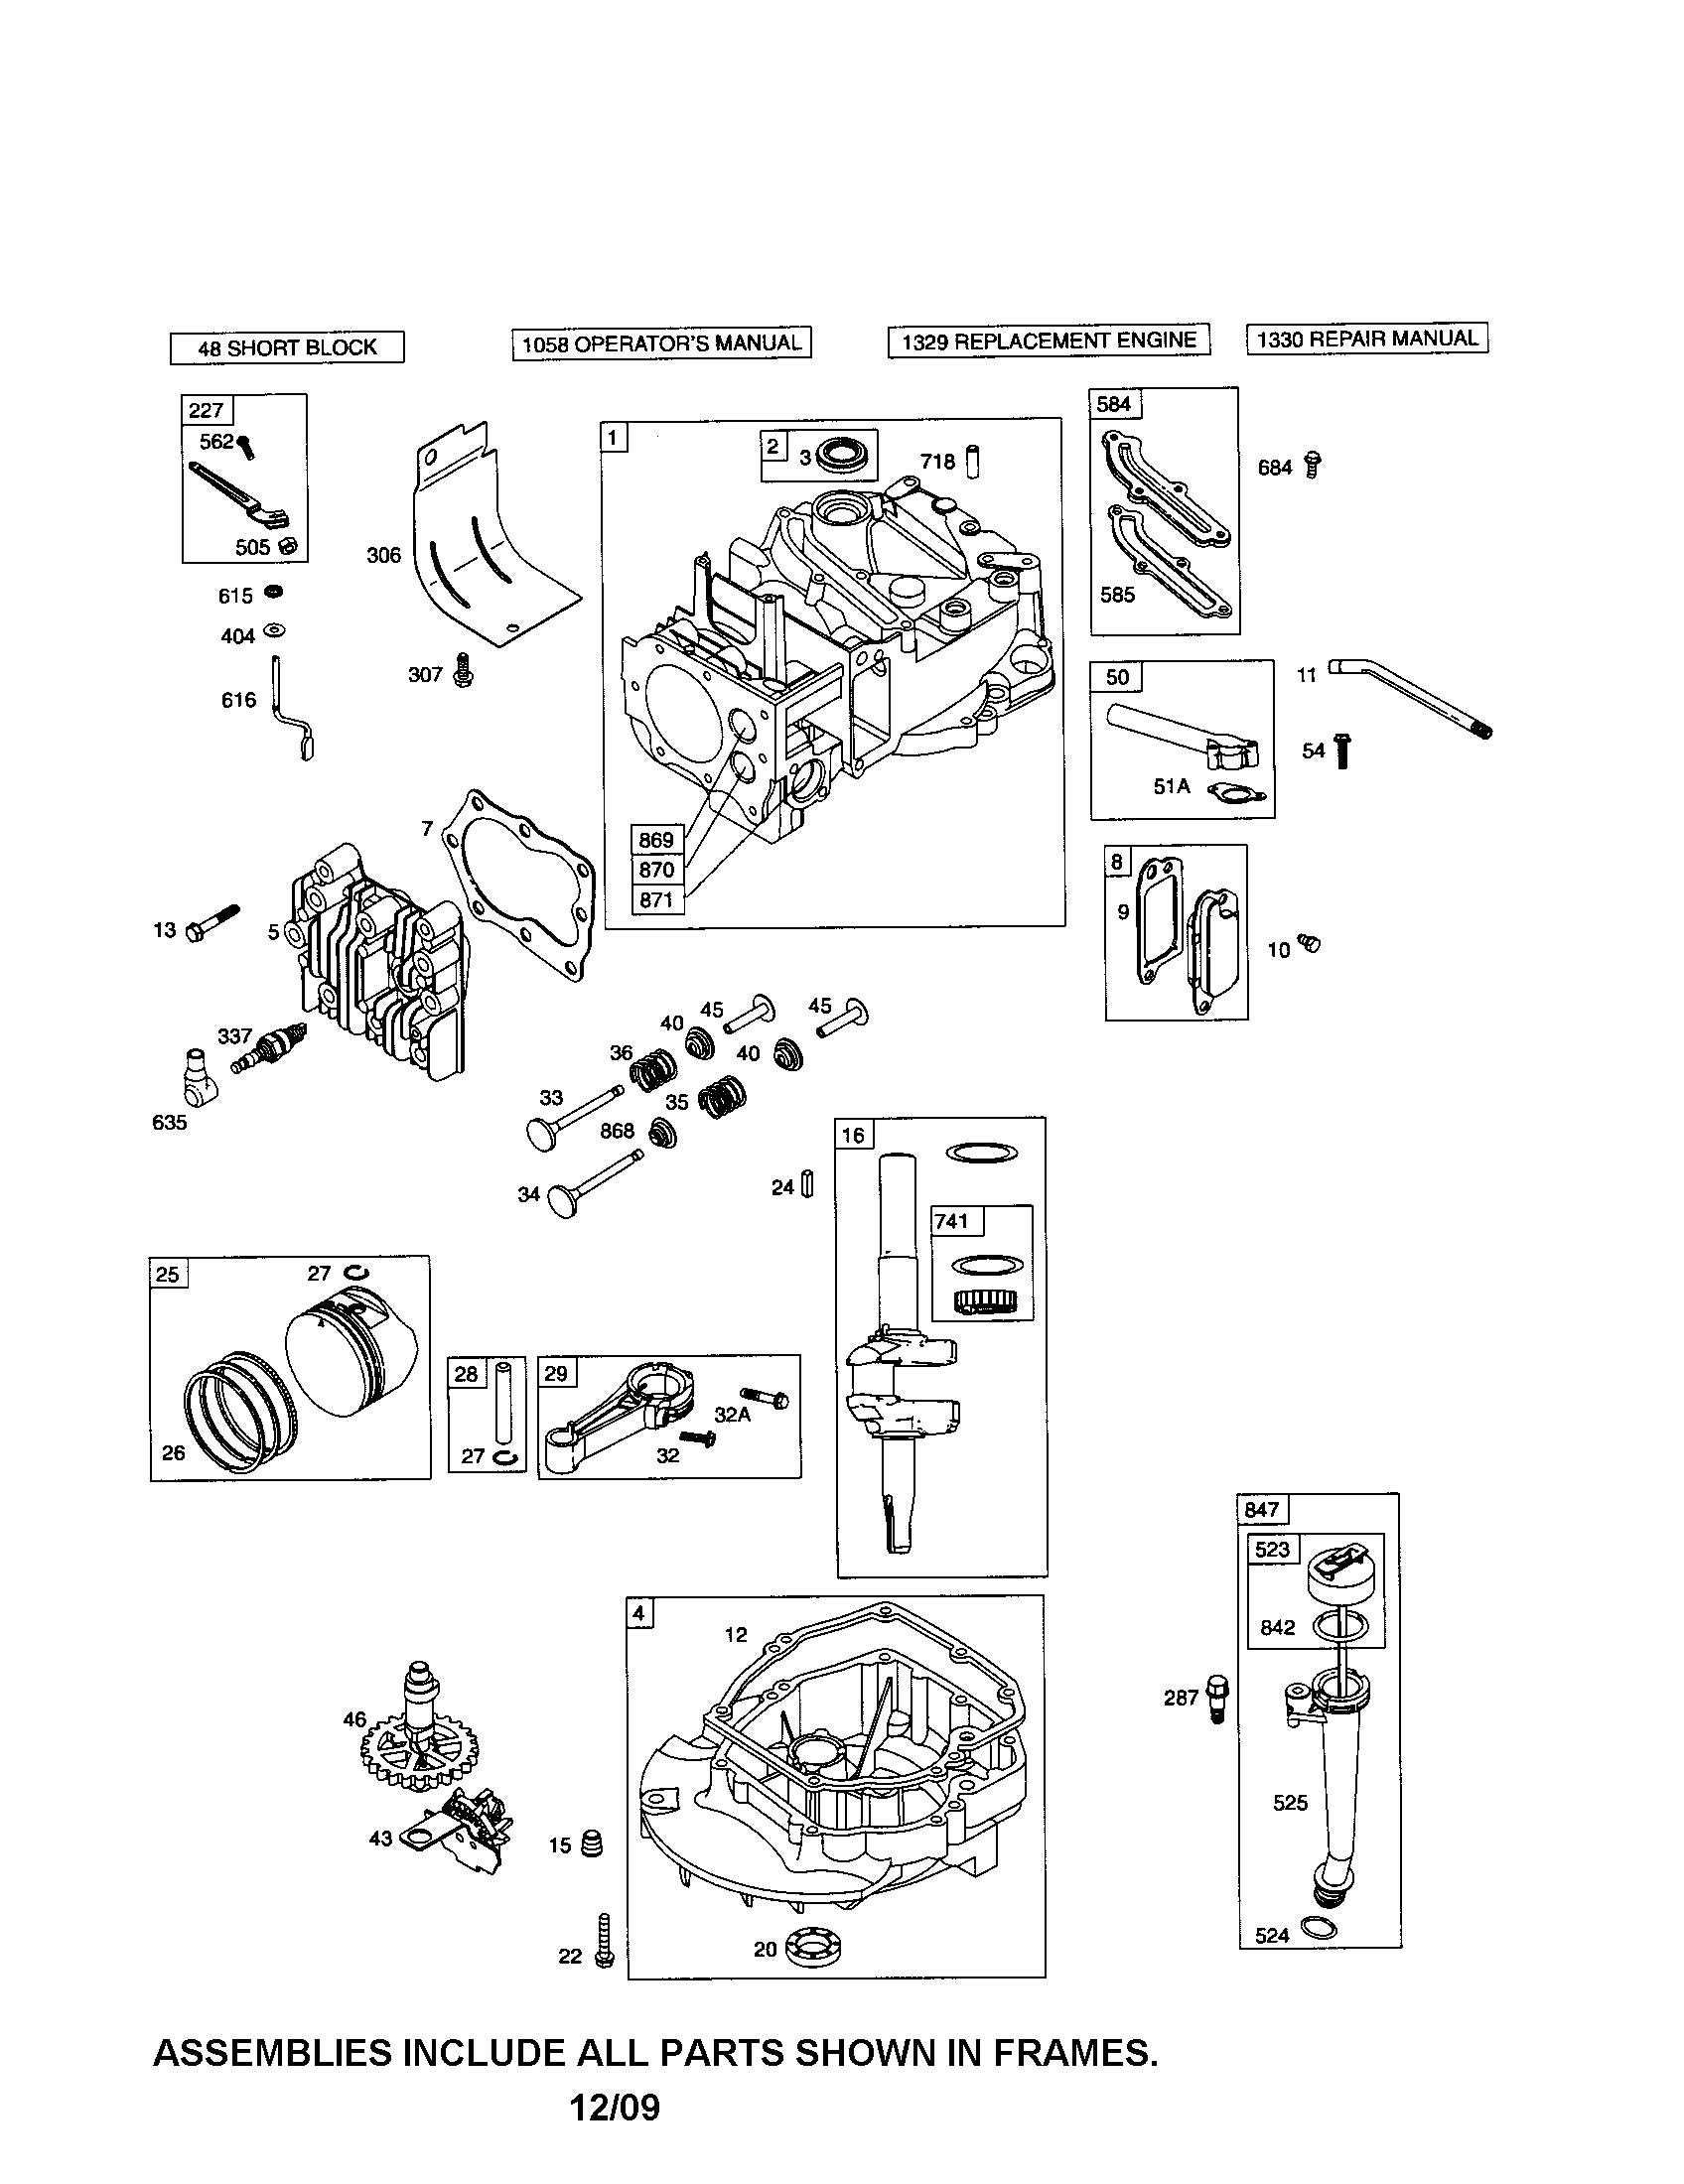 126t02 repair manua Toyota Forklift Engine Diagram array mnl 1669 briggs and stratton 126t02 repair manual 2019 ebook library rh jqmedical co